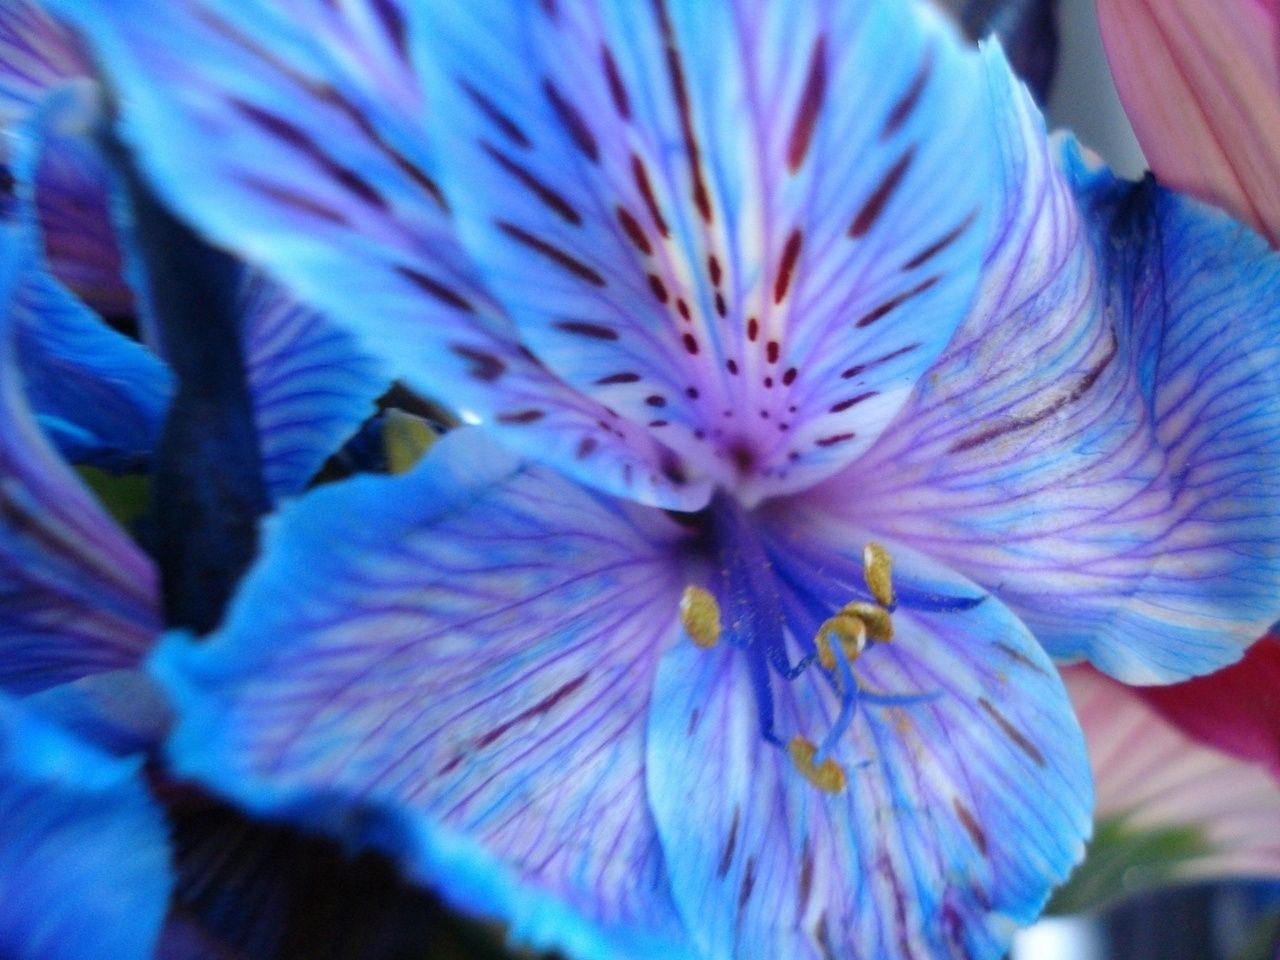 Purple Flower On Tumblr Blue Flower Wallpaper Peruvian Lilies Blue Flower Pictures